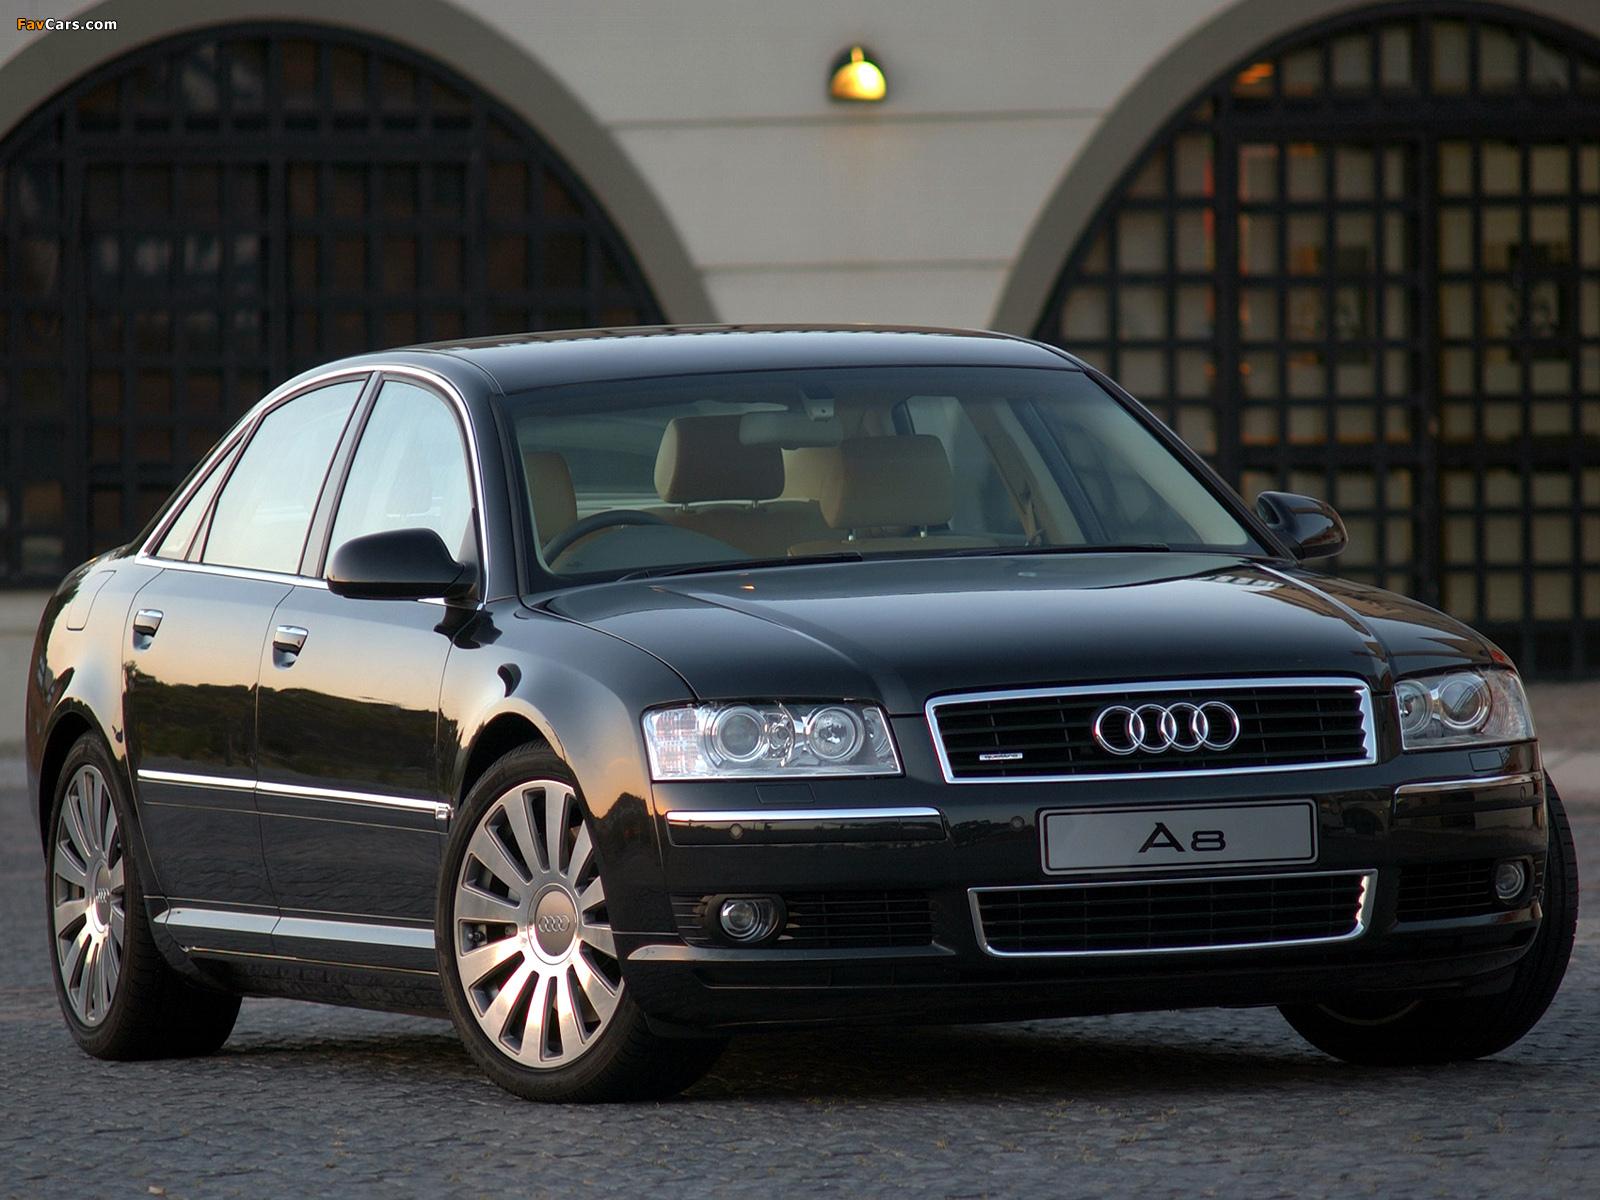 Audi A8 42 quattro ZA spec D3 200305 wallpapers 1600x1200 1600x1200